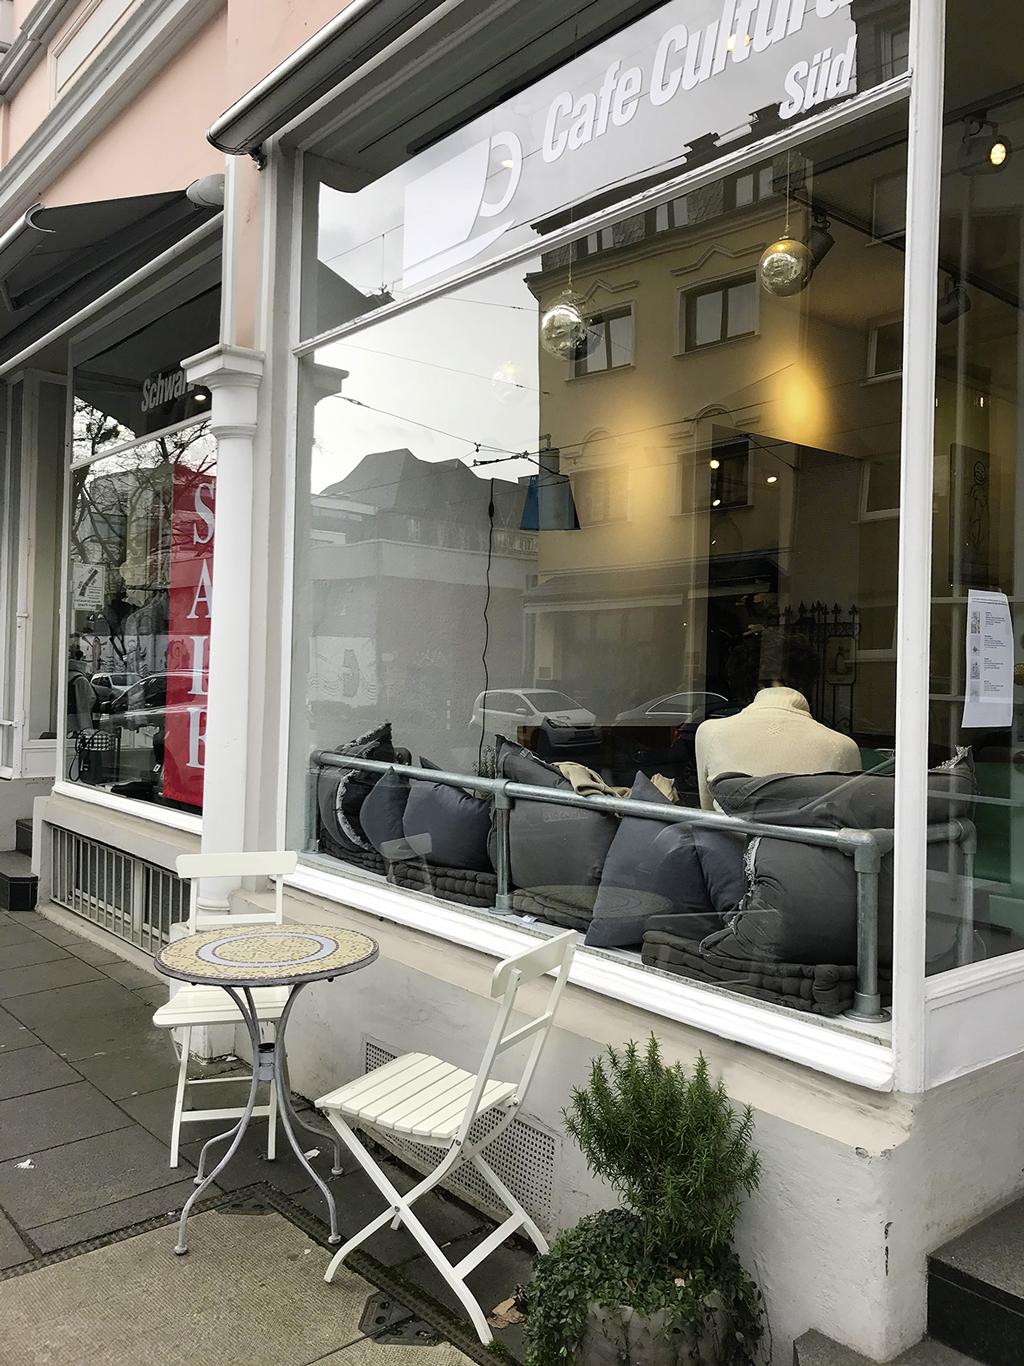 Caffe Cultura Süd Bonn